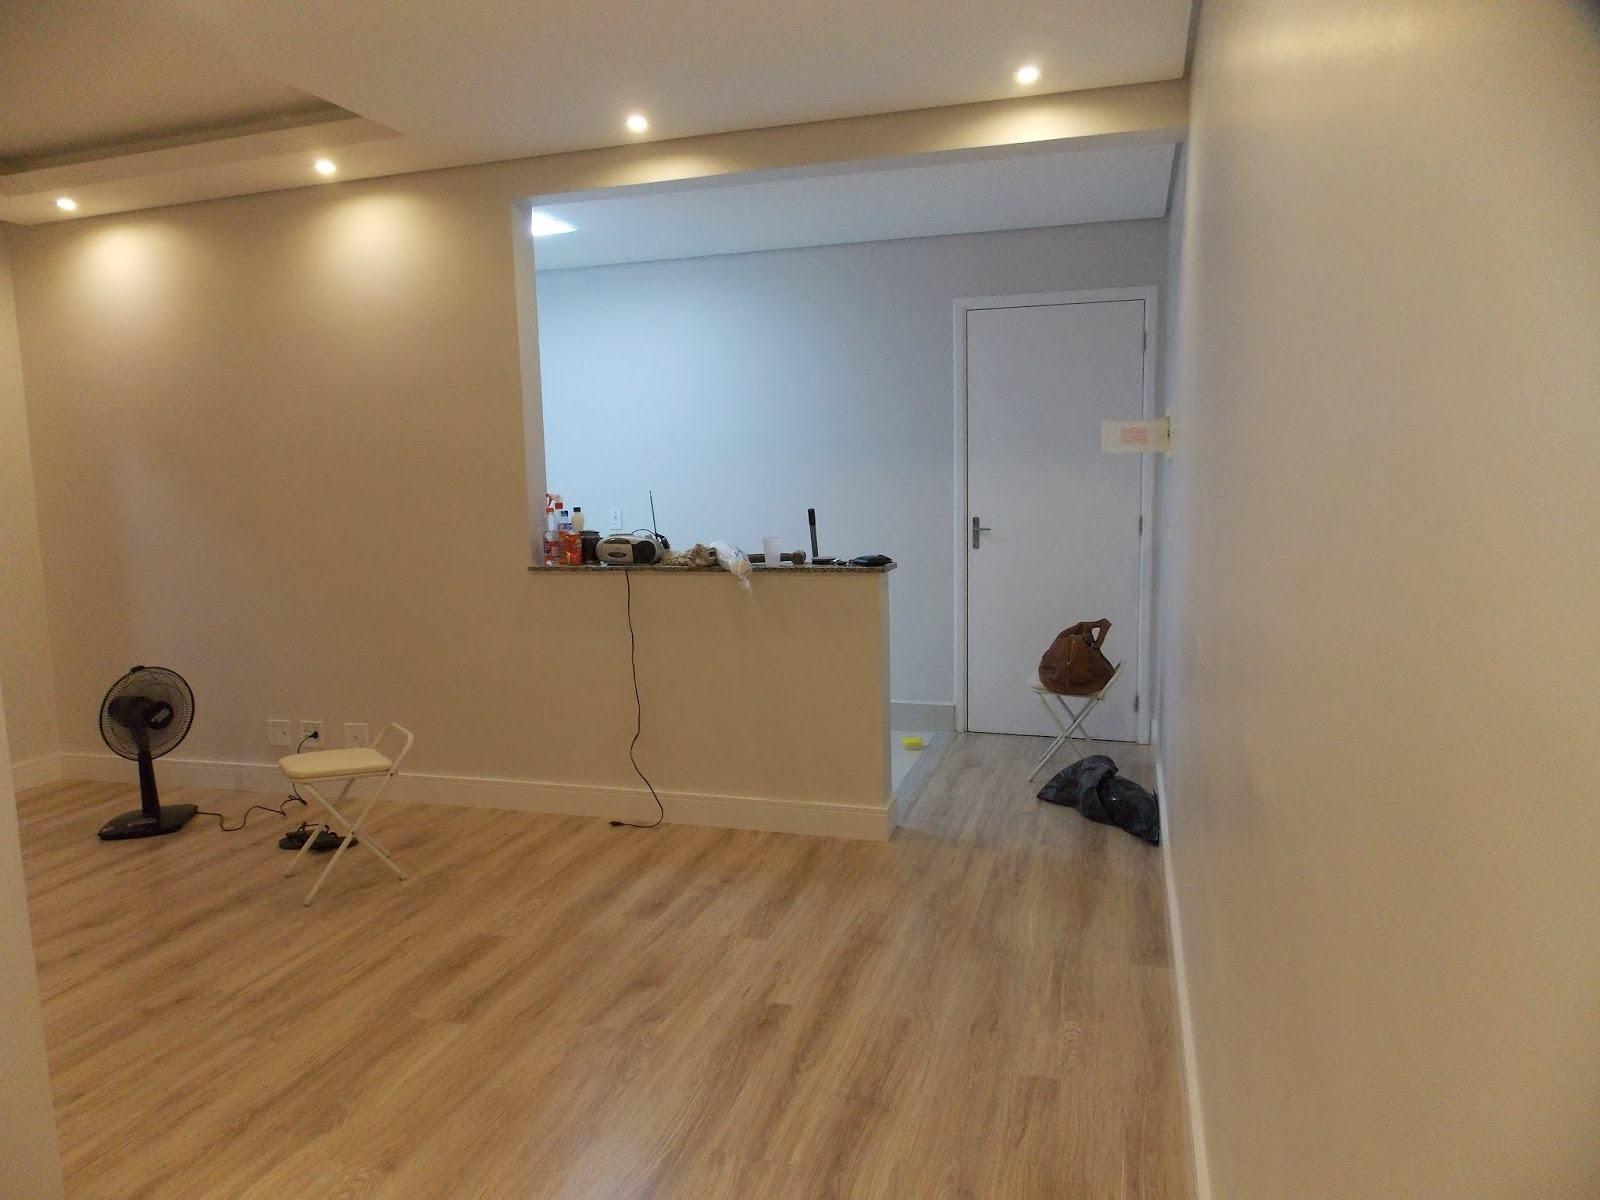 Modelos de laminado para apartamento pequeno pisos em for Modelos de apartamentos pequenos